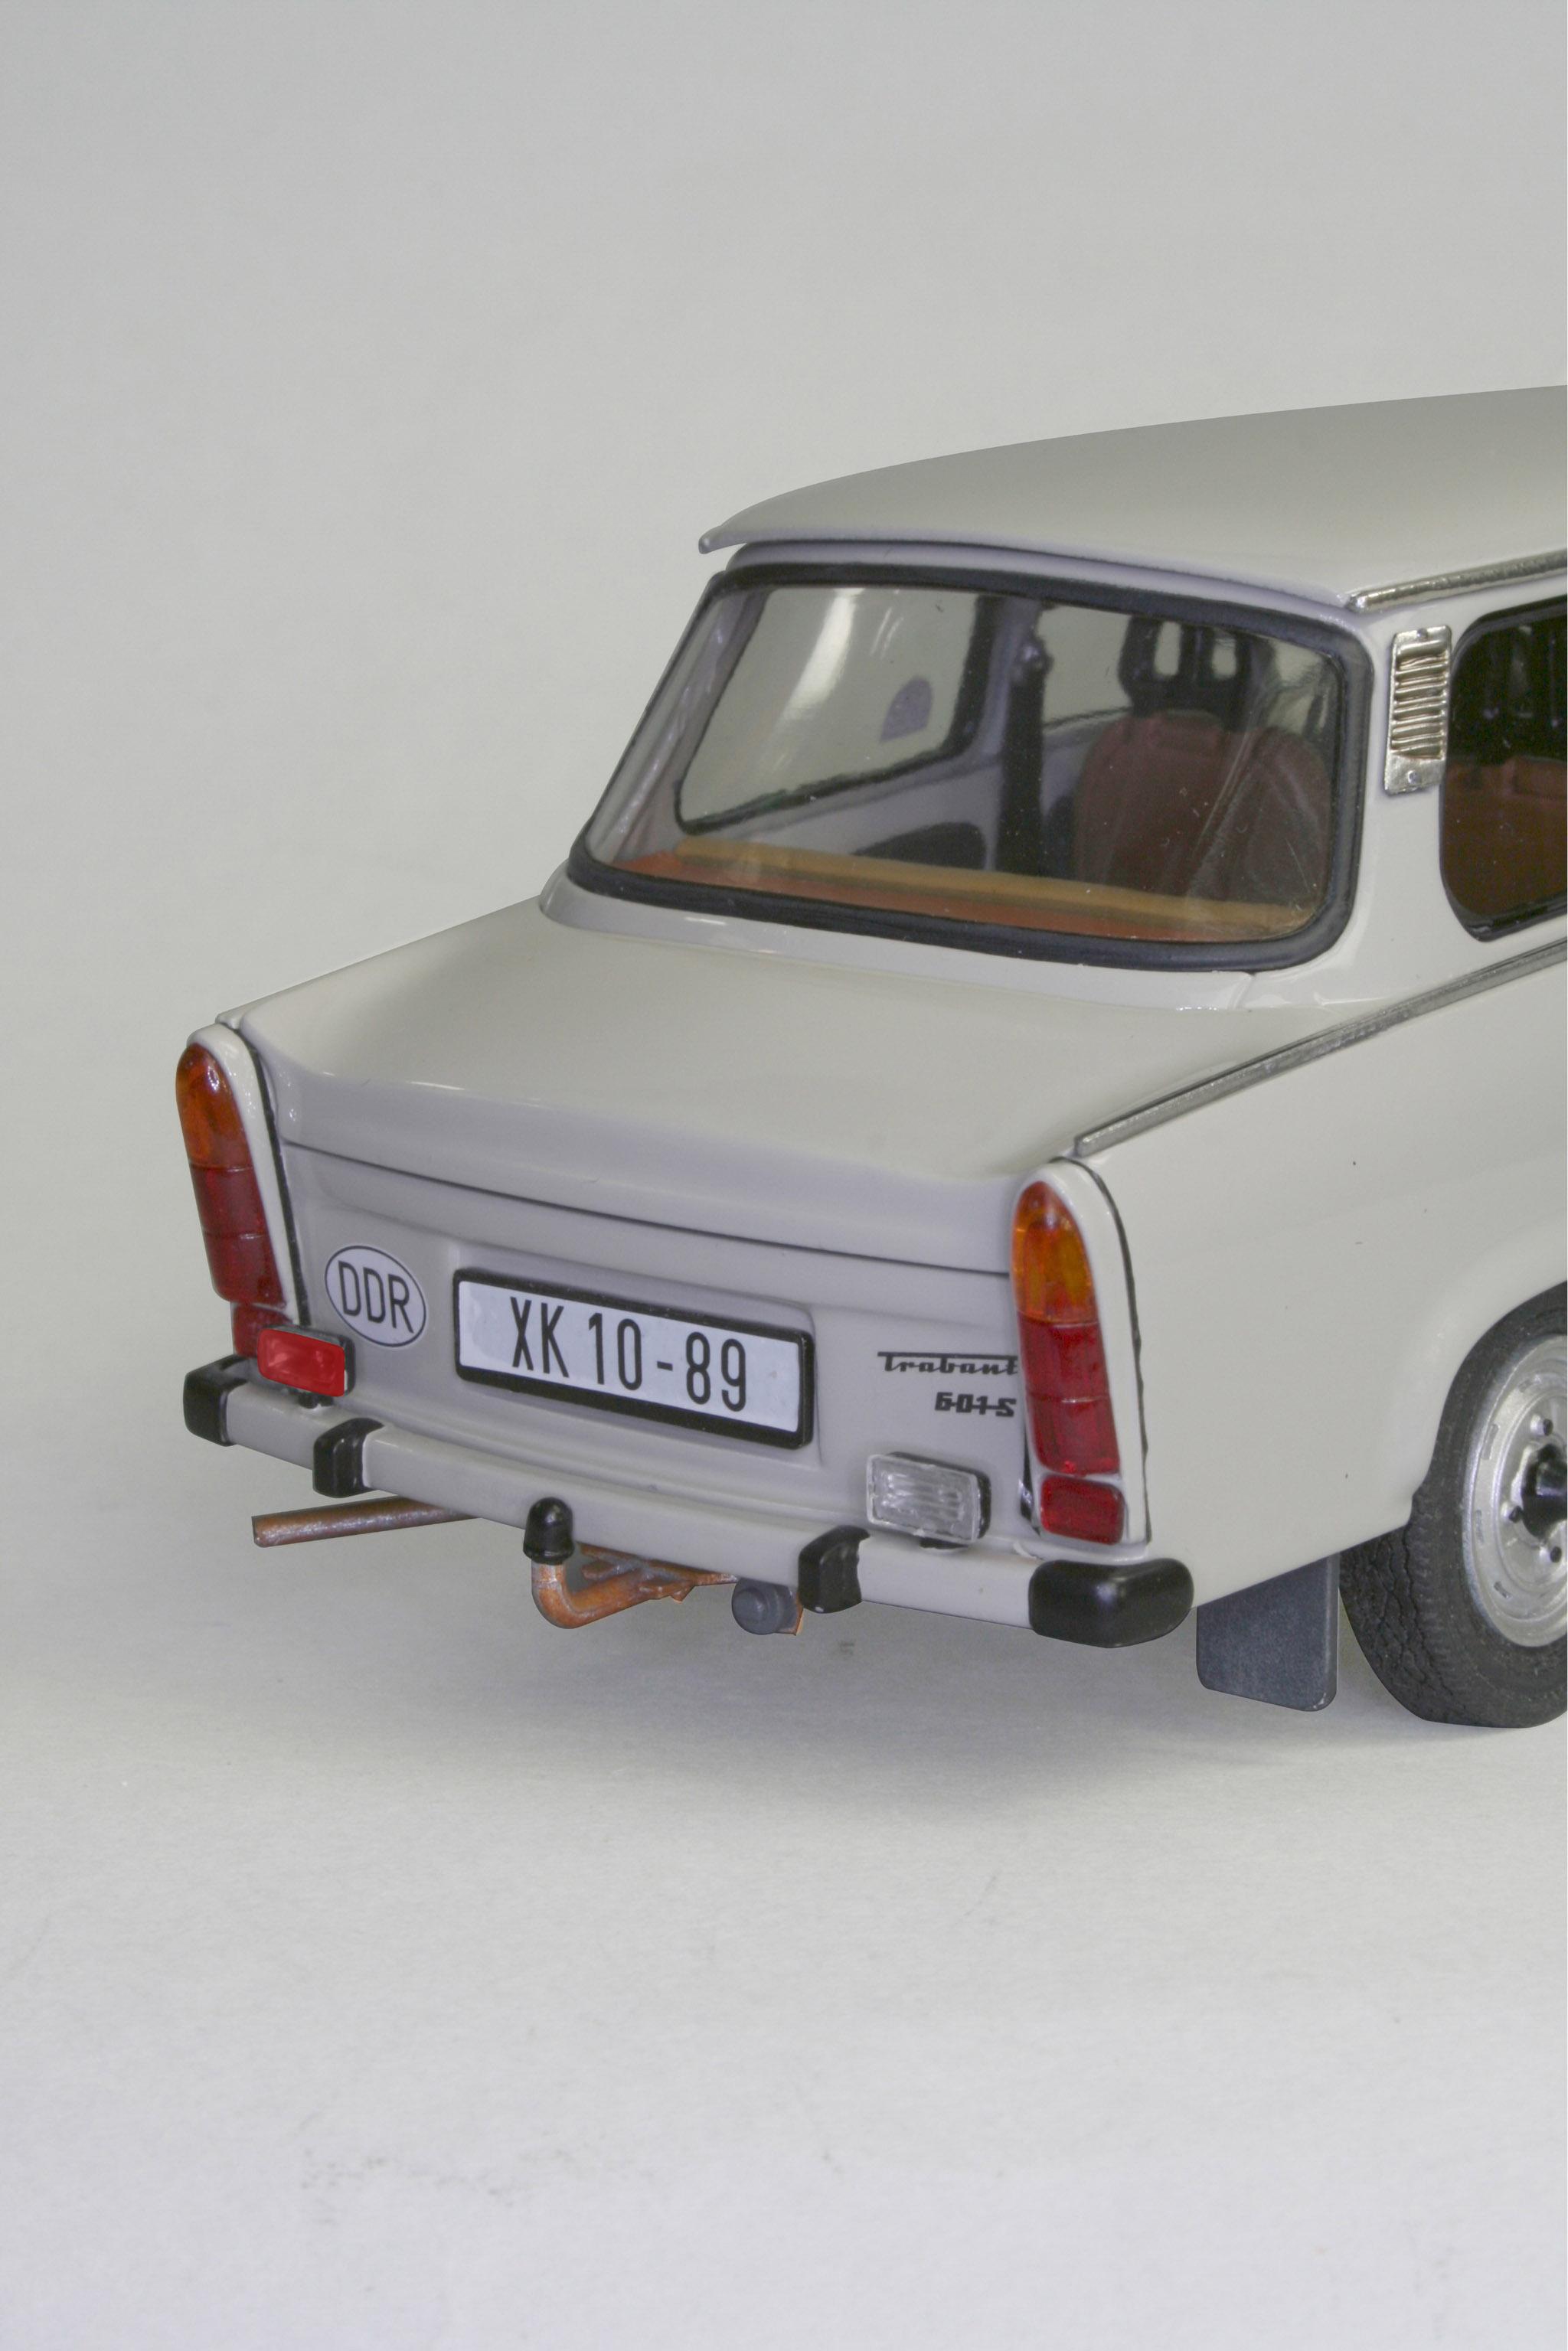 revell 07256 trabant 601s limousine modellbau remscheid carrera rc spielwaren spielzeug. Black Bedroom Furniture Sets. Home Design Ideas